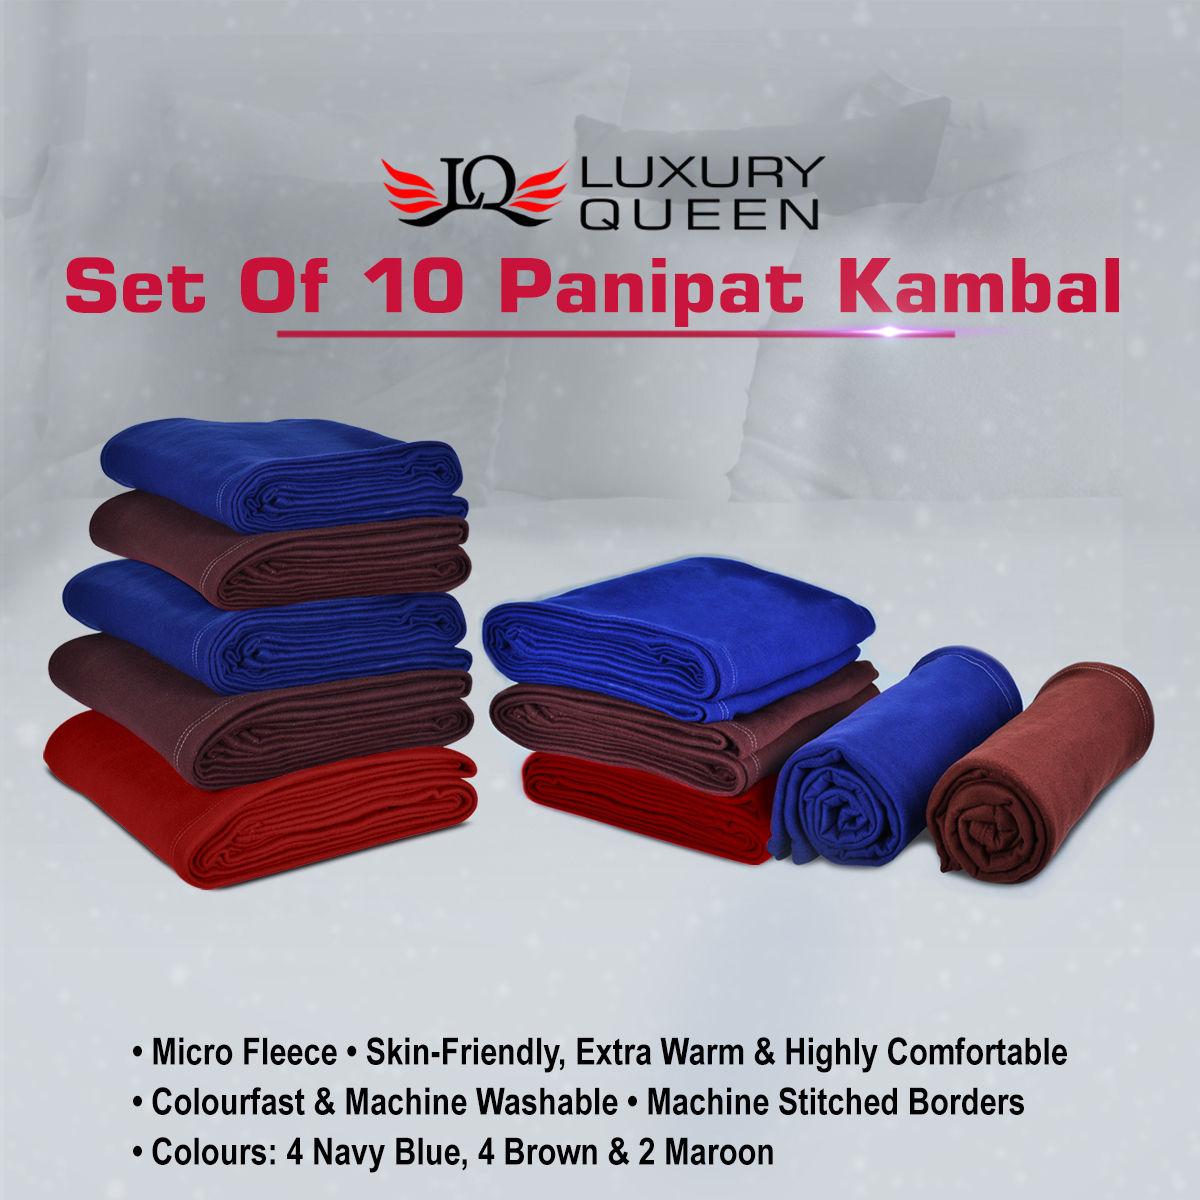 Buy Set Of 10 Panipat Kambal Online At Best Price In India